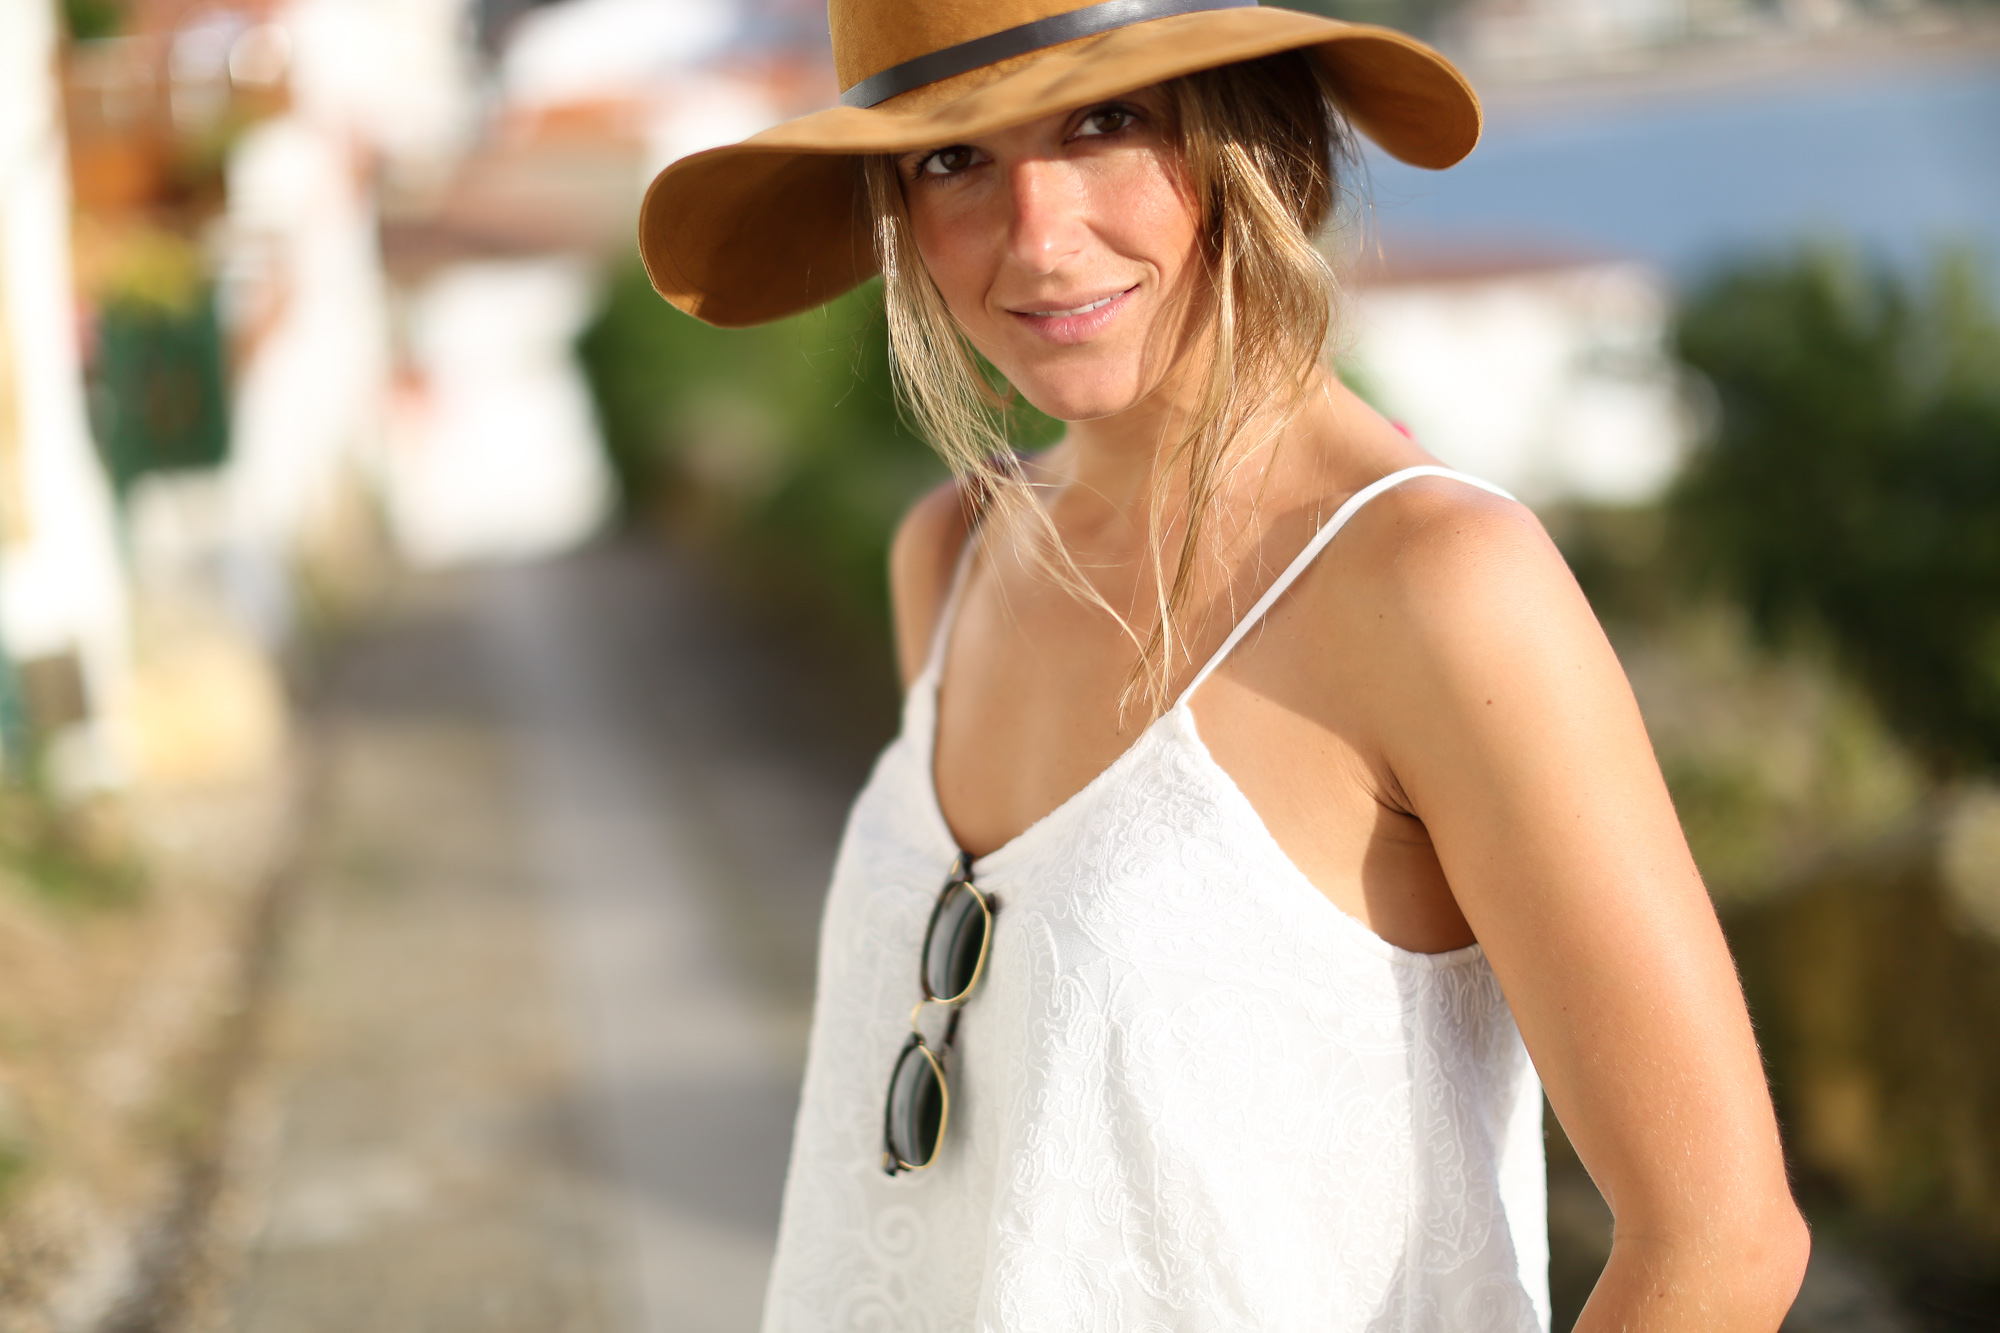 Clochet_streetstyle_levis_501_vintage_shorts_leather_fedora_hat-4